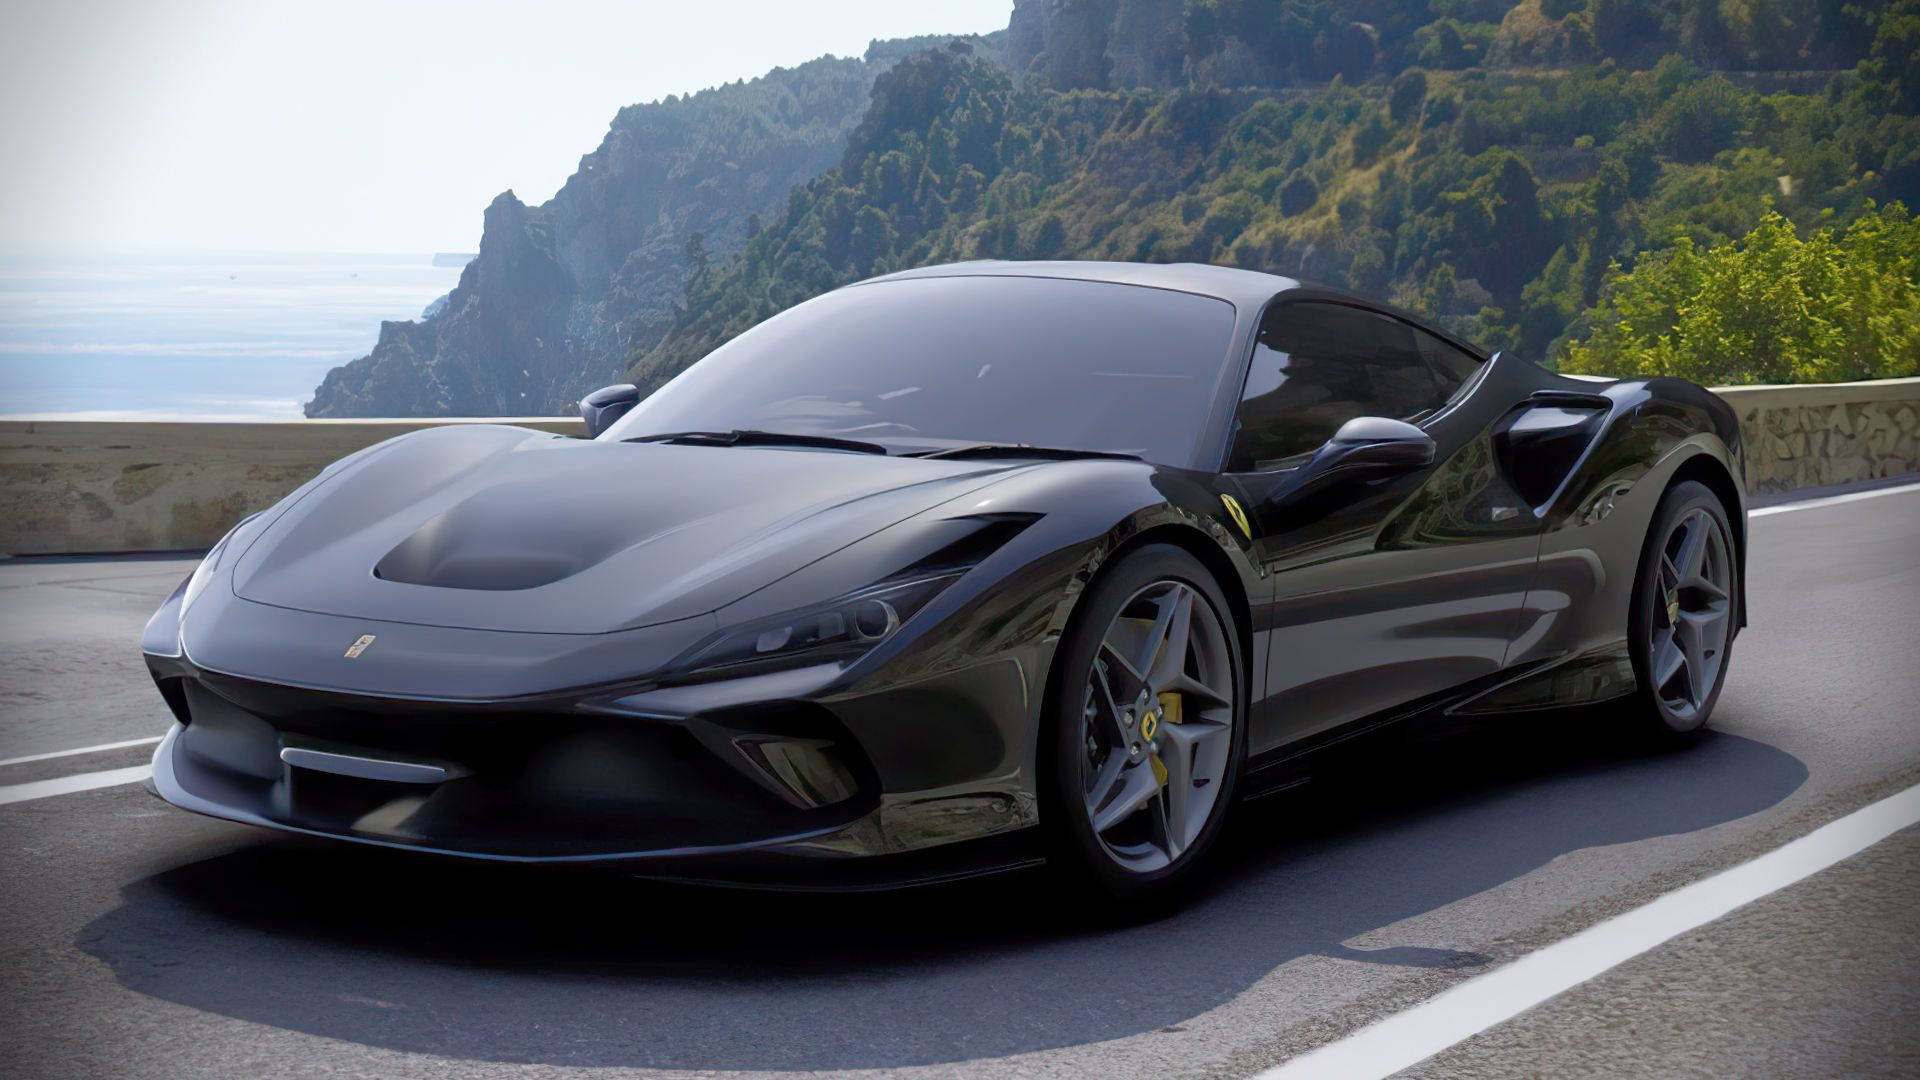 2020 Ferrari F8 Tributo Black Wallpaper In 2020 Sports Cars Luxury Ferrari Dream Cars